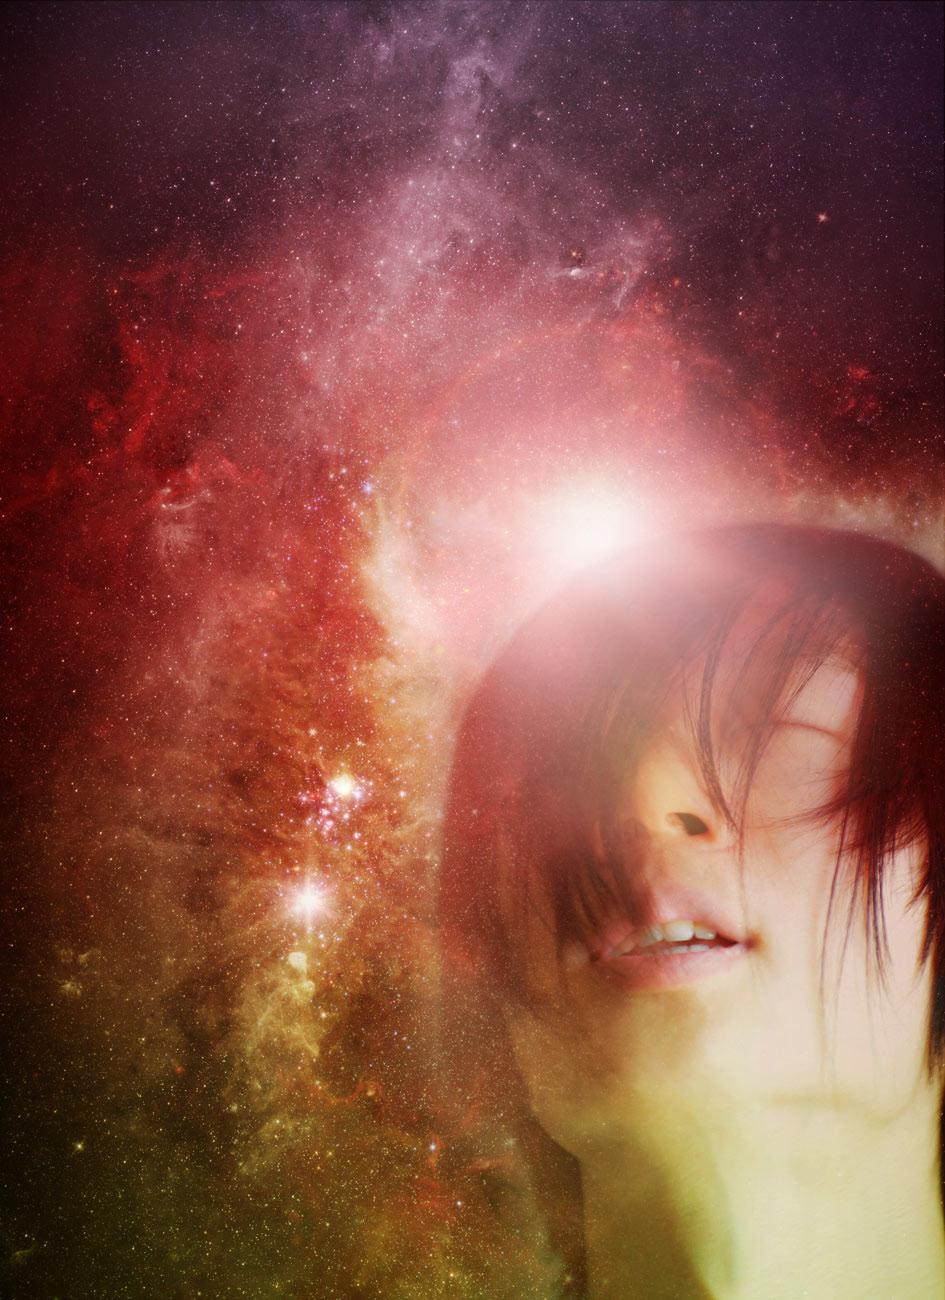 art Space  universe cosmos solarsystem Love